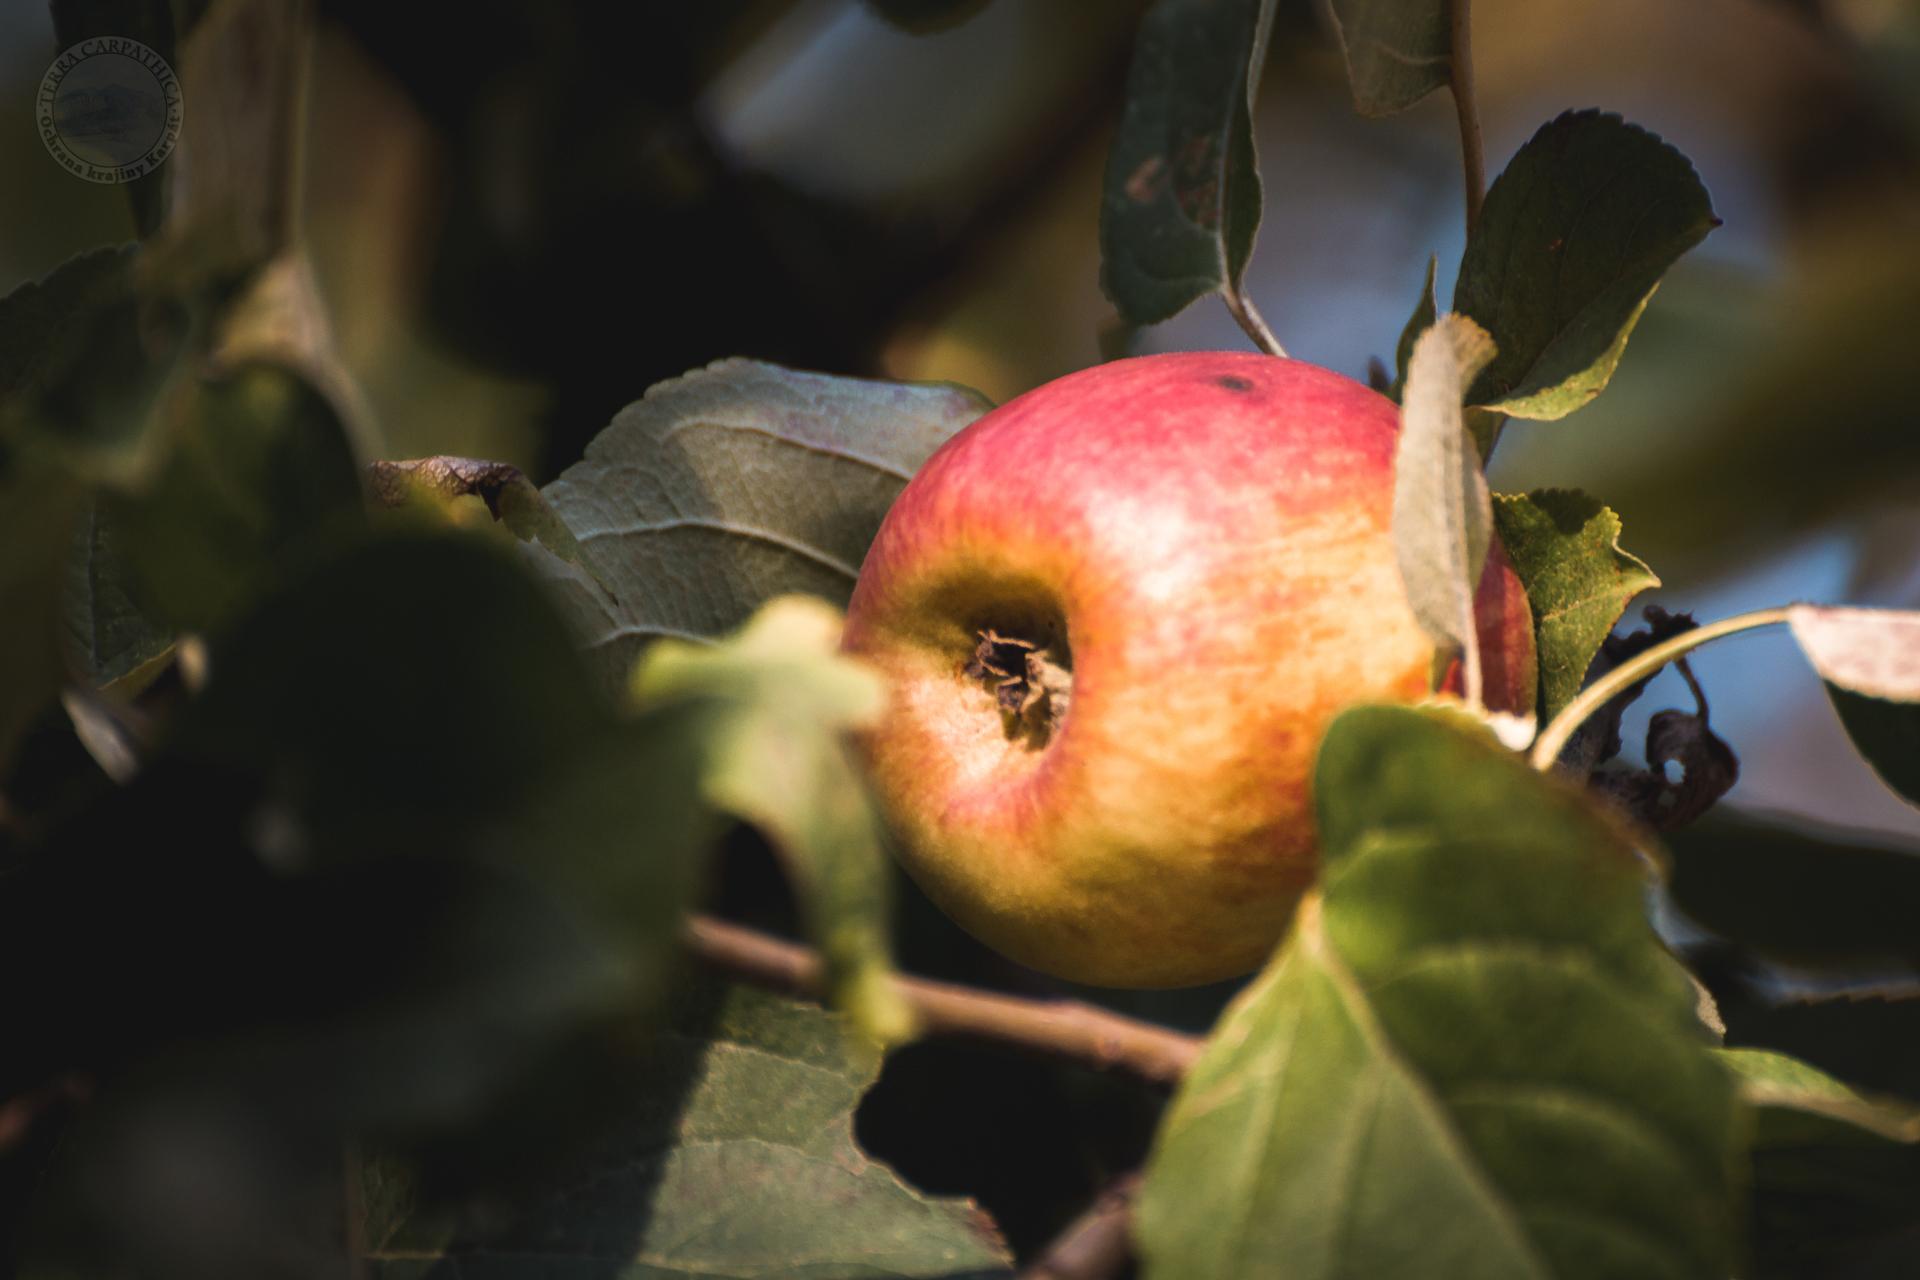 Jeseň-jabloň